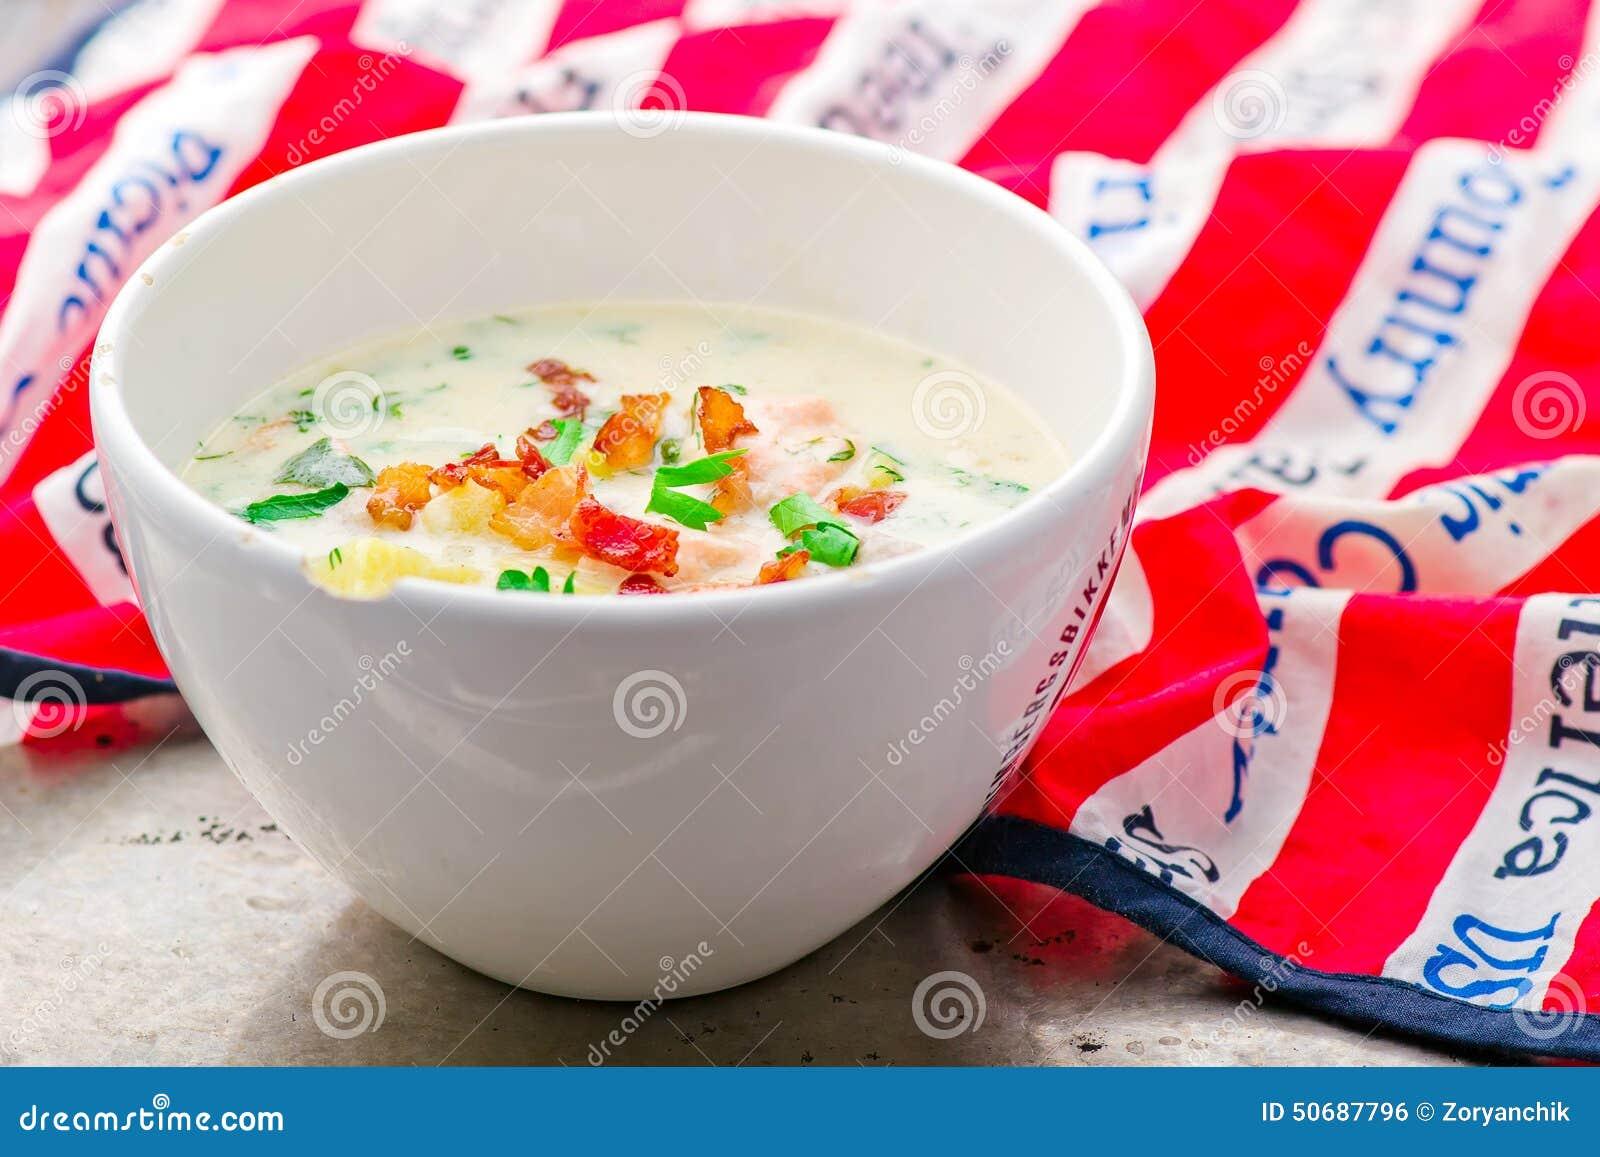 Download 与三文鱼和烟肉的杂烩 库存照片. 图片 包括有 食物, 膳食, 烹调, 午餐, 乳脂状, 鲜美, 温暖, 三文鱼 - 50687796